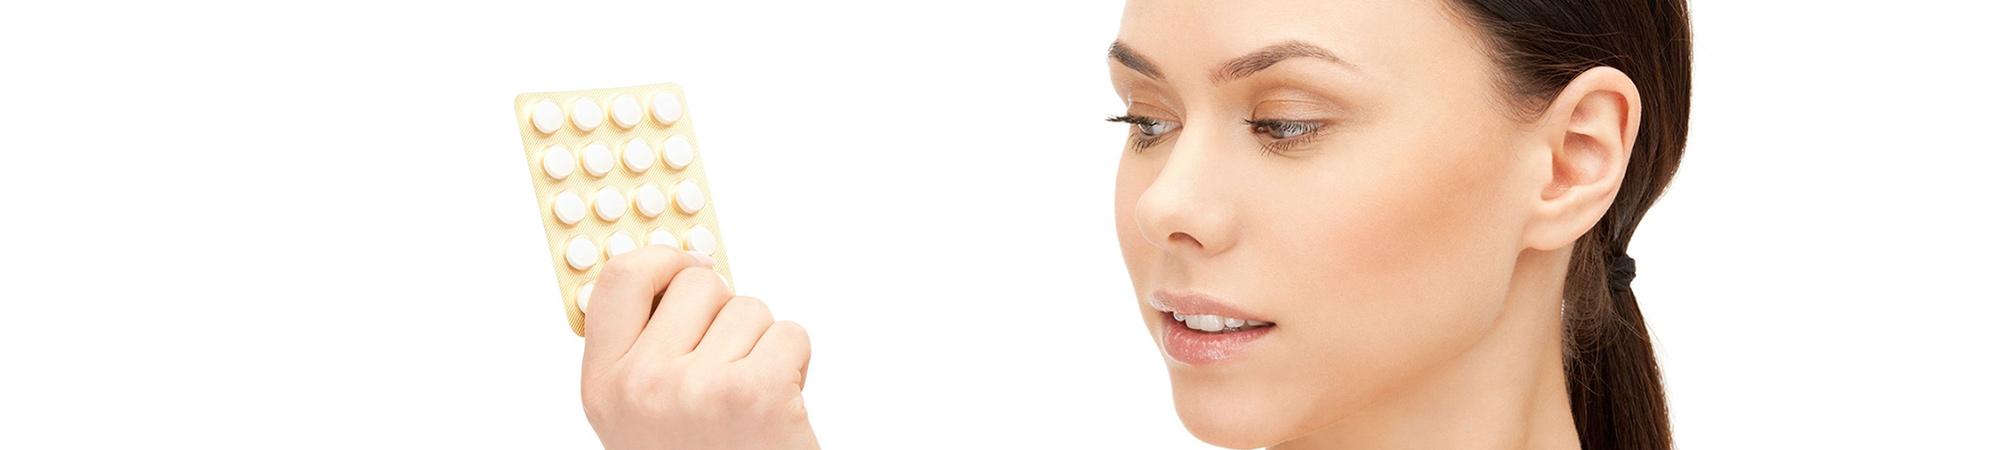 frauenarzt gynäkologe gevelsberg verhütung